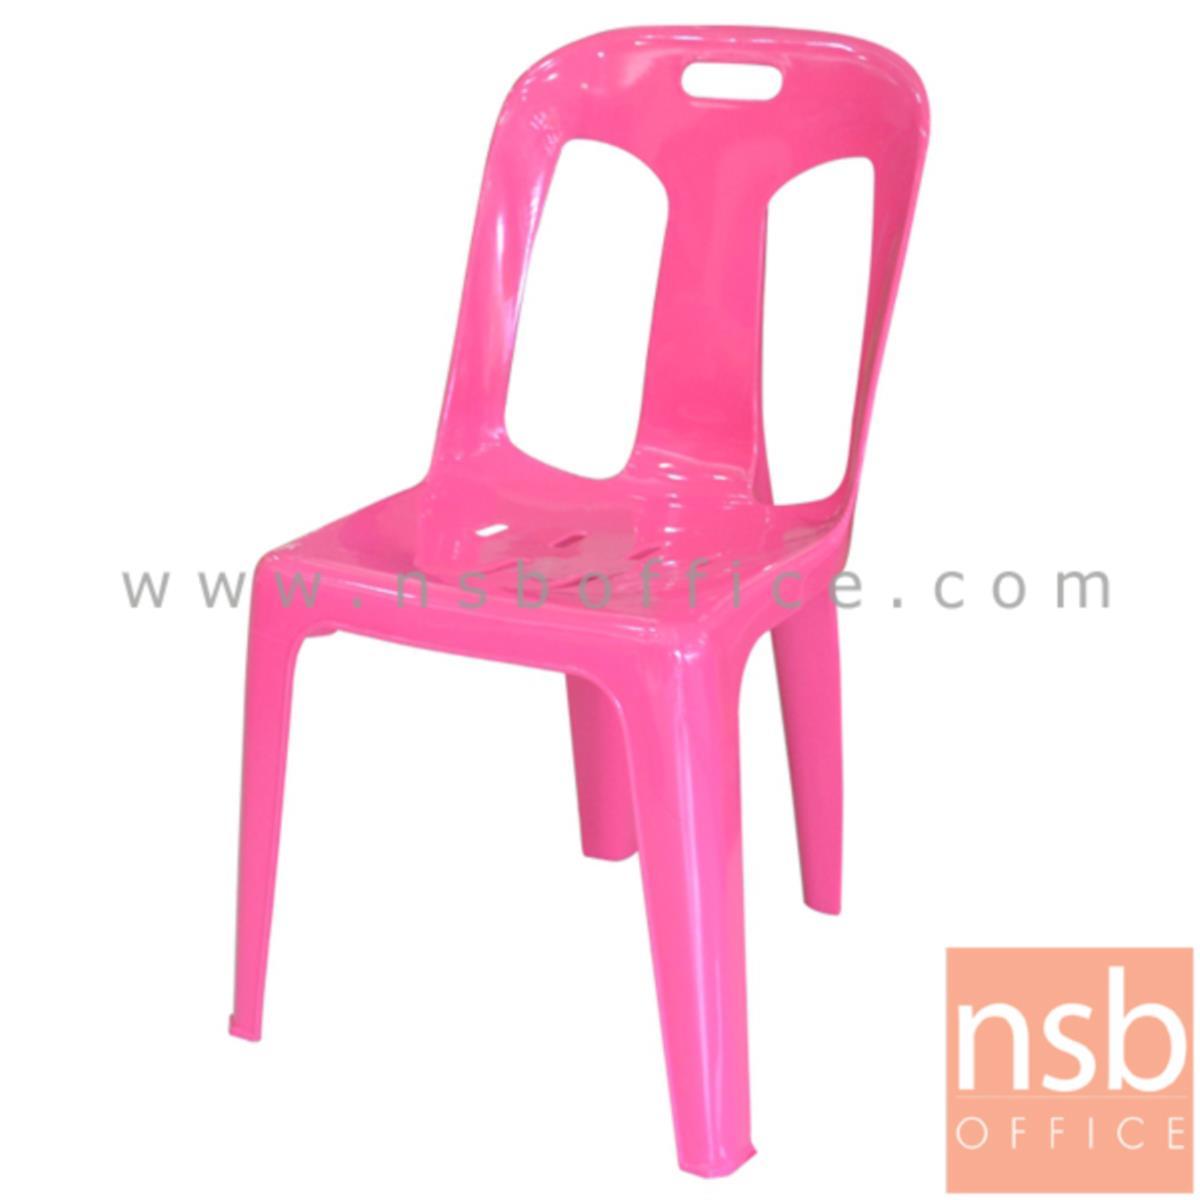 B10A075:เก้าอี้พลาสติก รุ่น CH-5123 ซ้อนเก็บได้ (พลาสติกเกรด A)